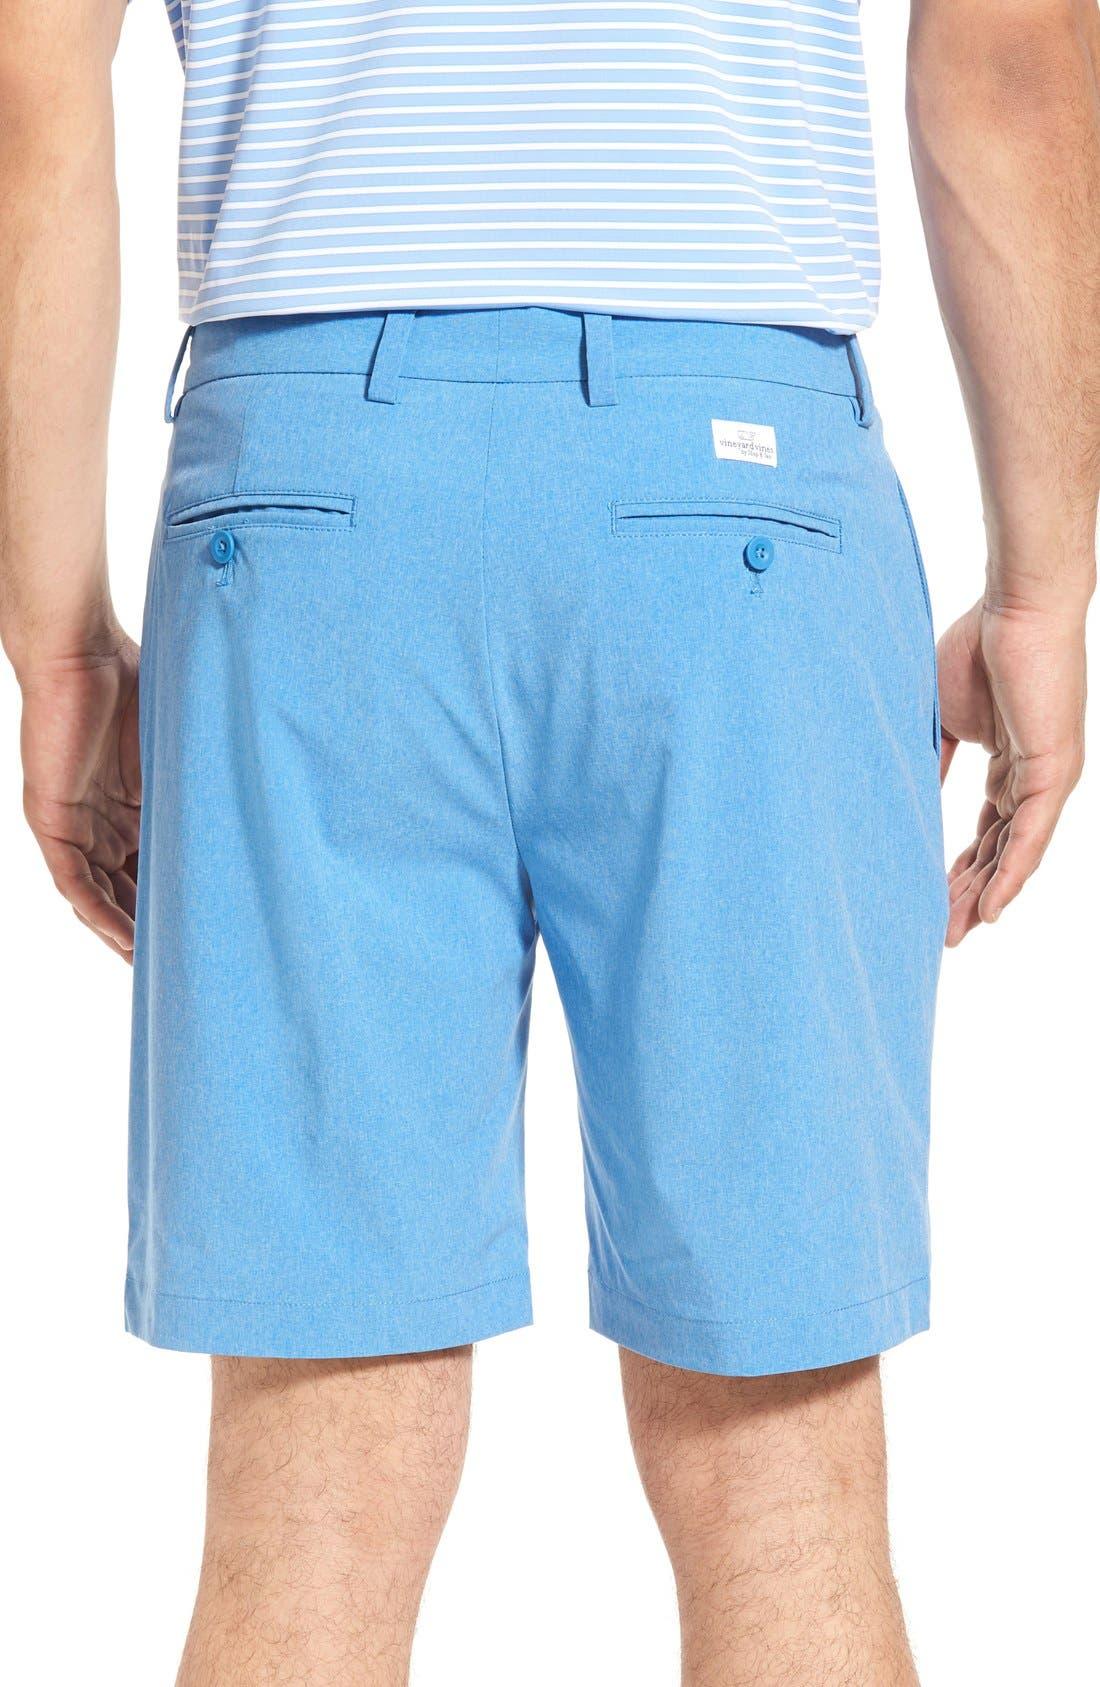 8 Inch Performance Breaker Shorts,                             Alternate thumbnail 66, color,